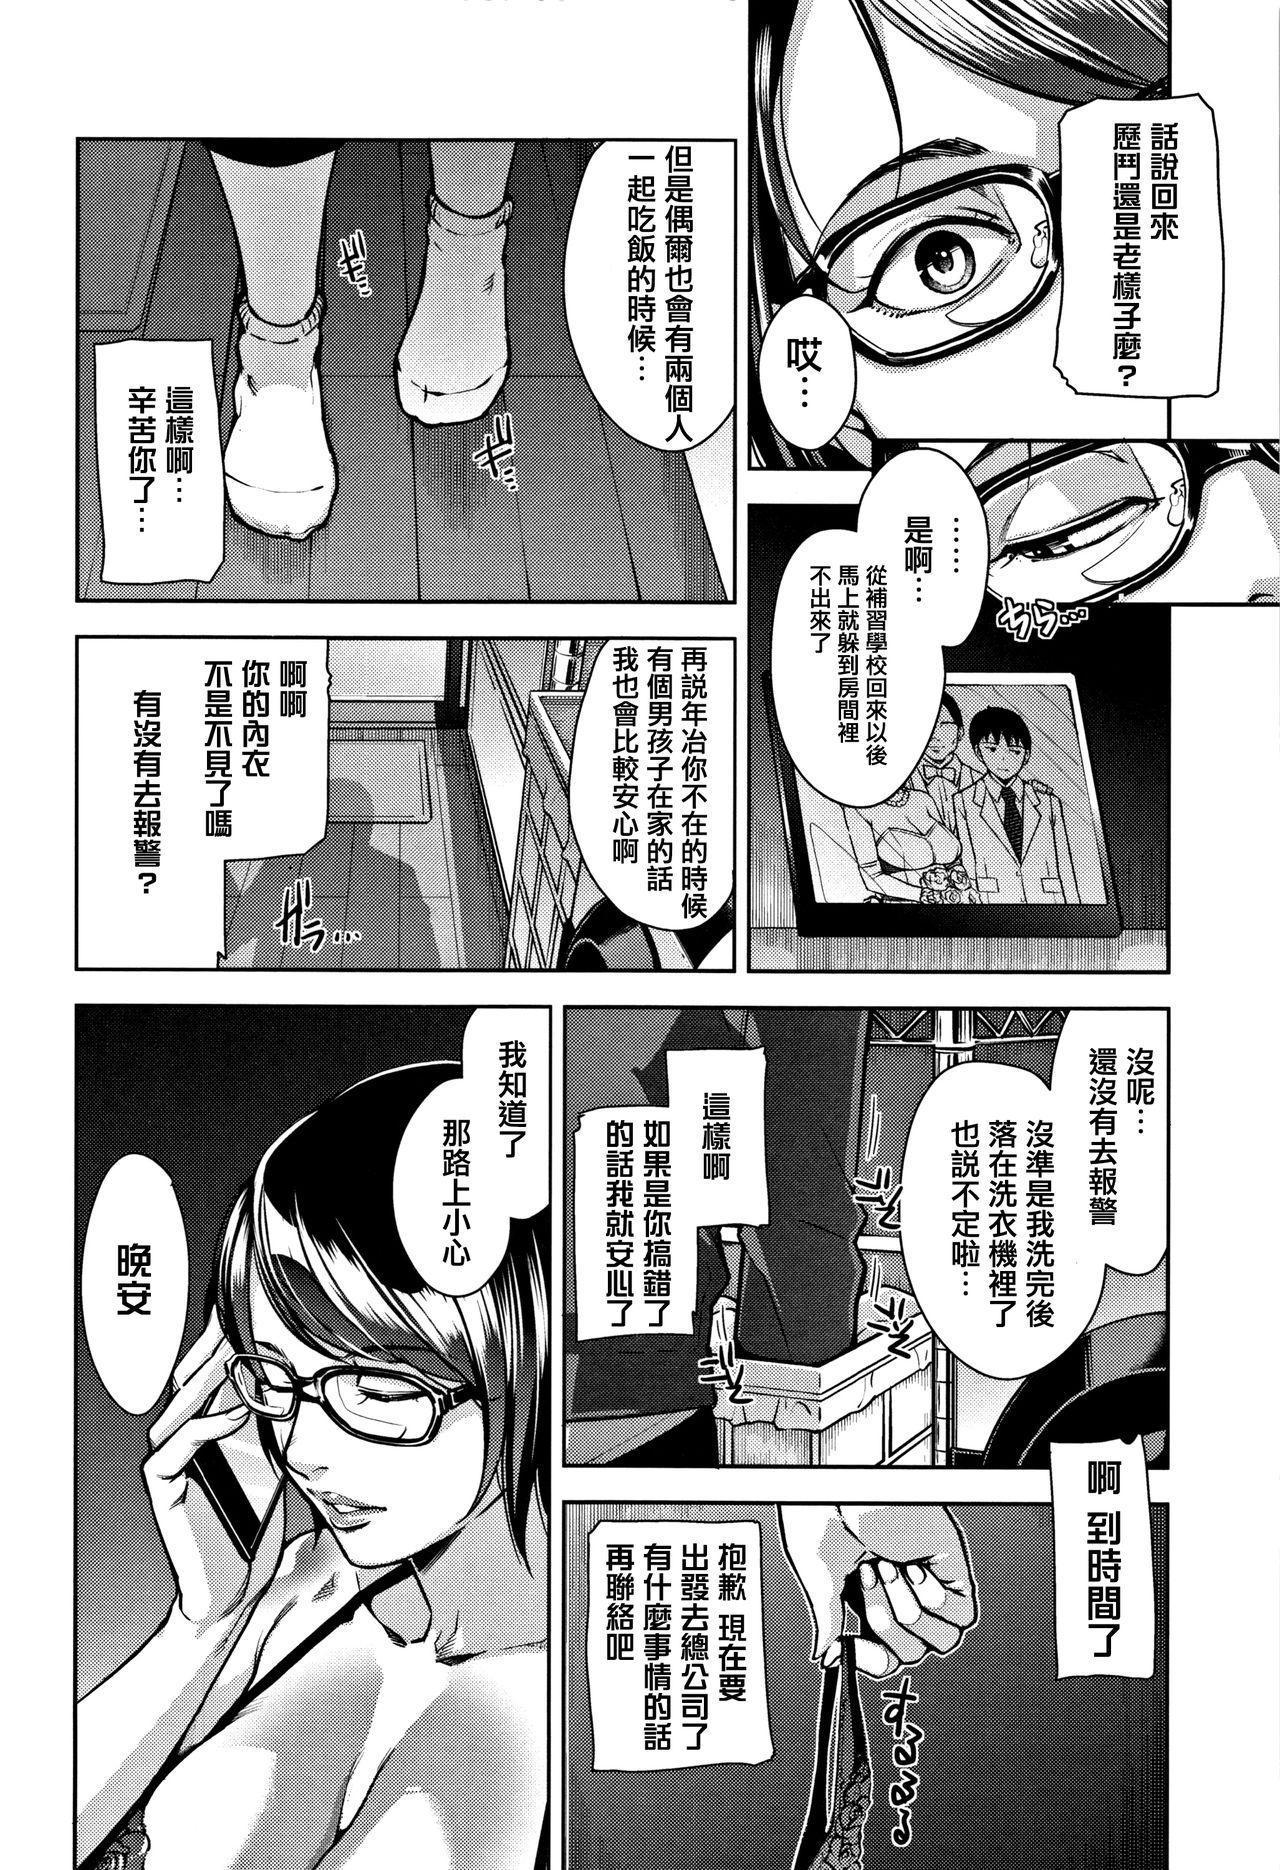 Kanjyuku Chijyo 47